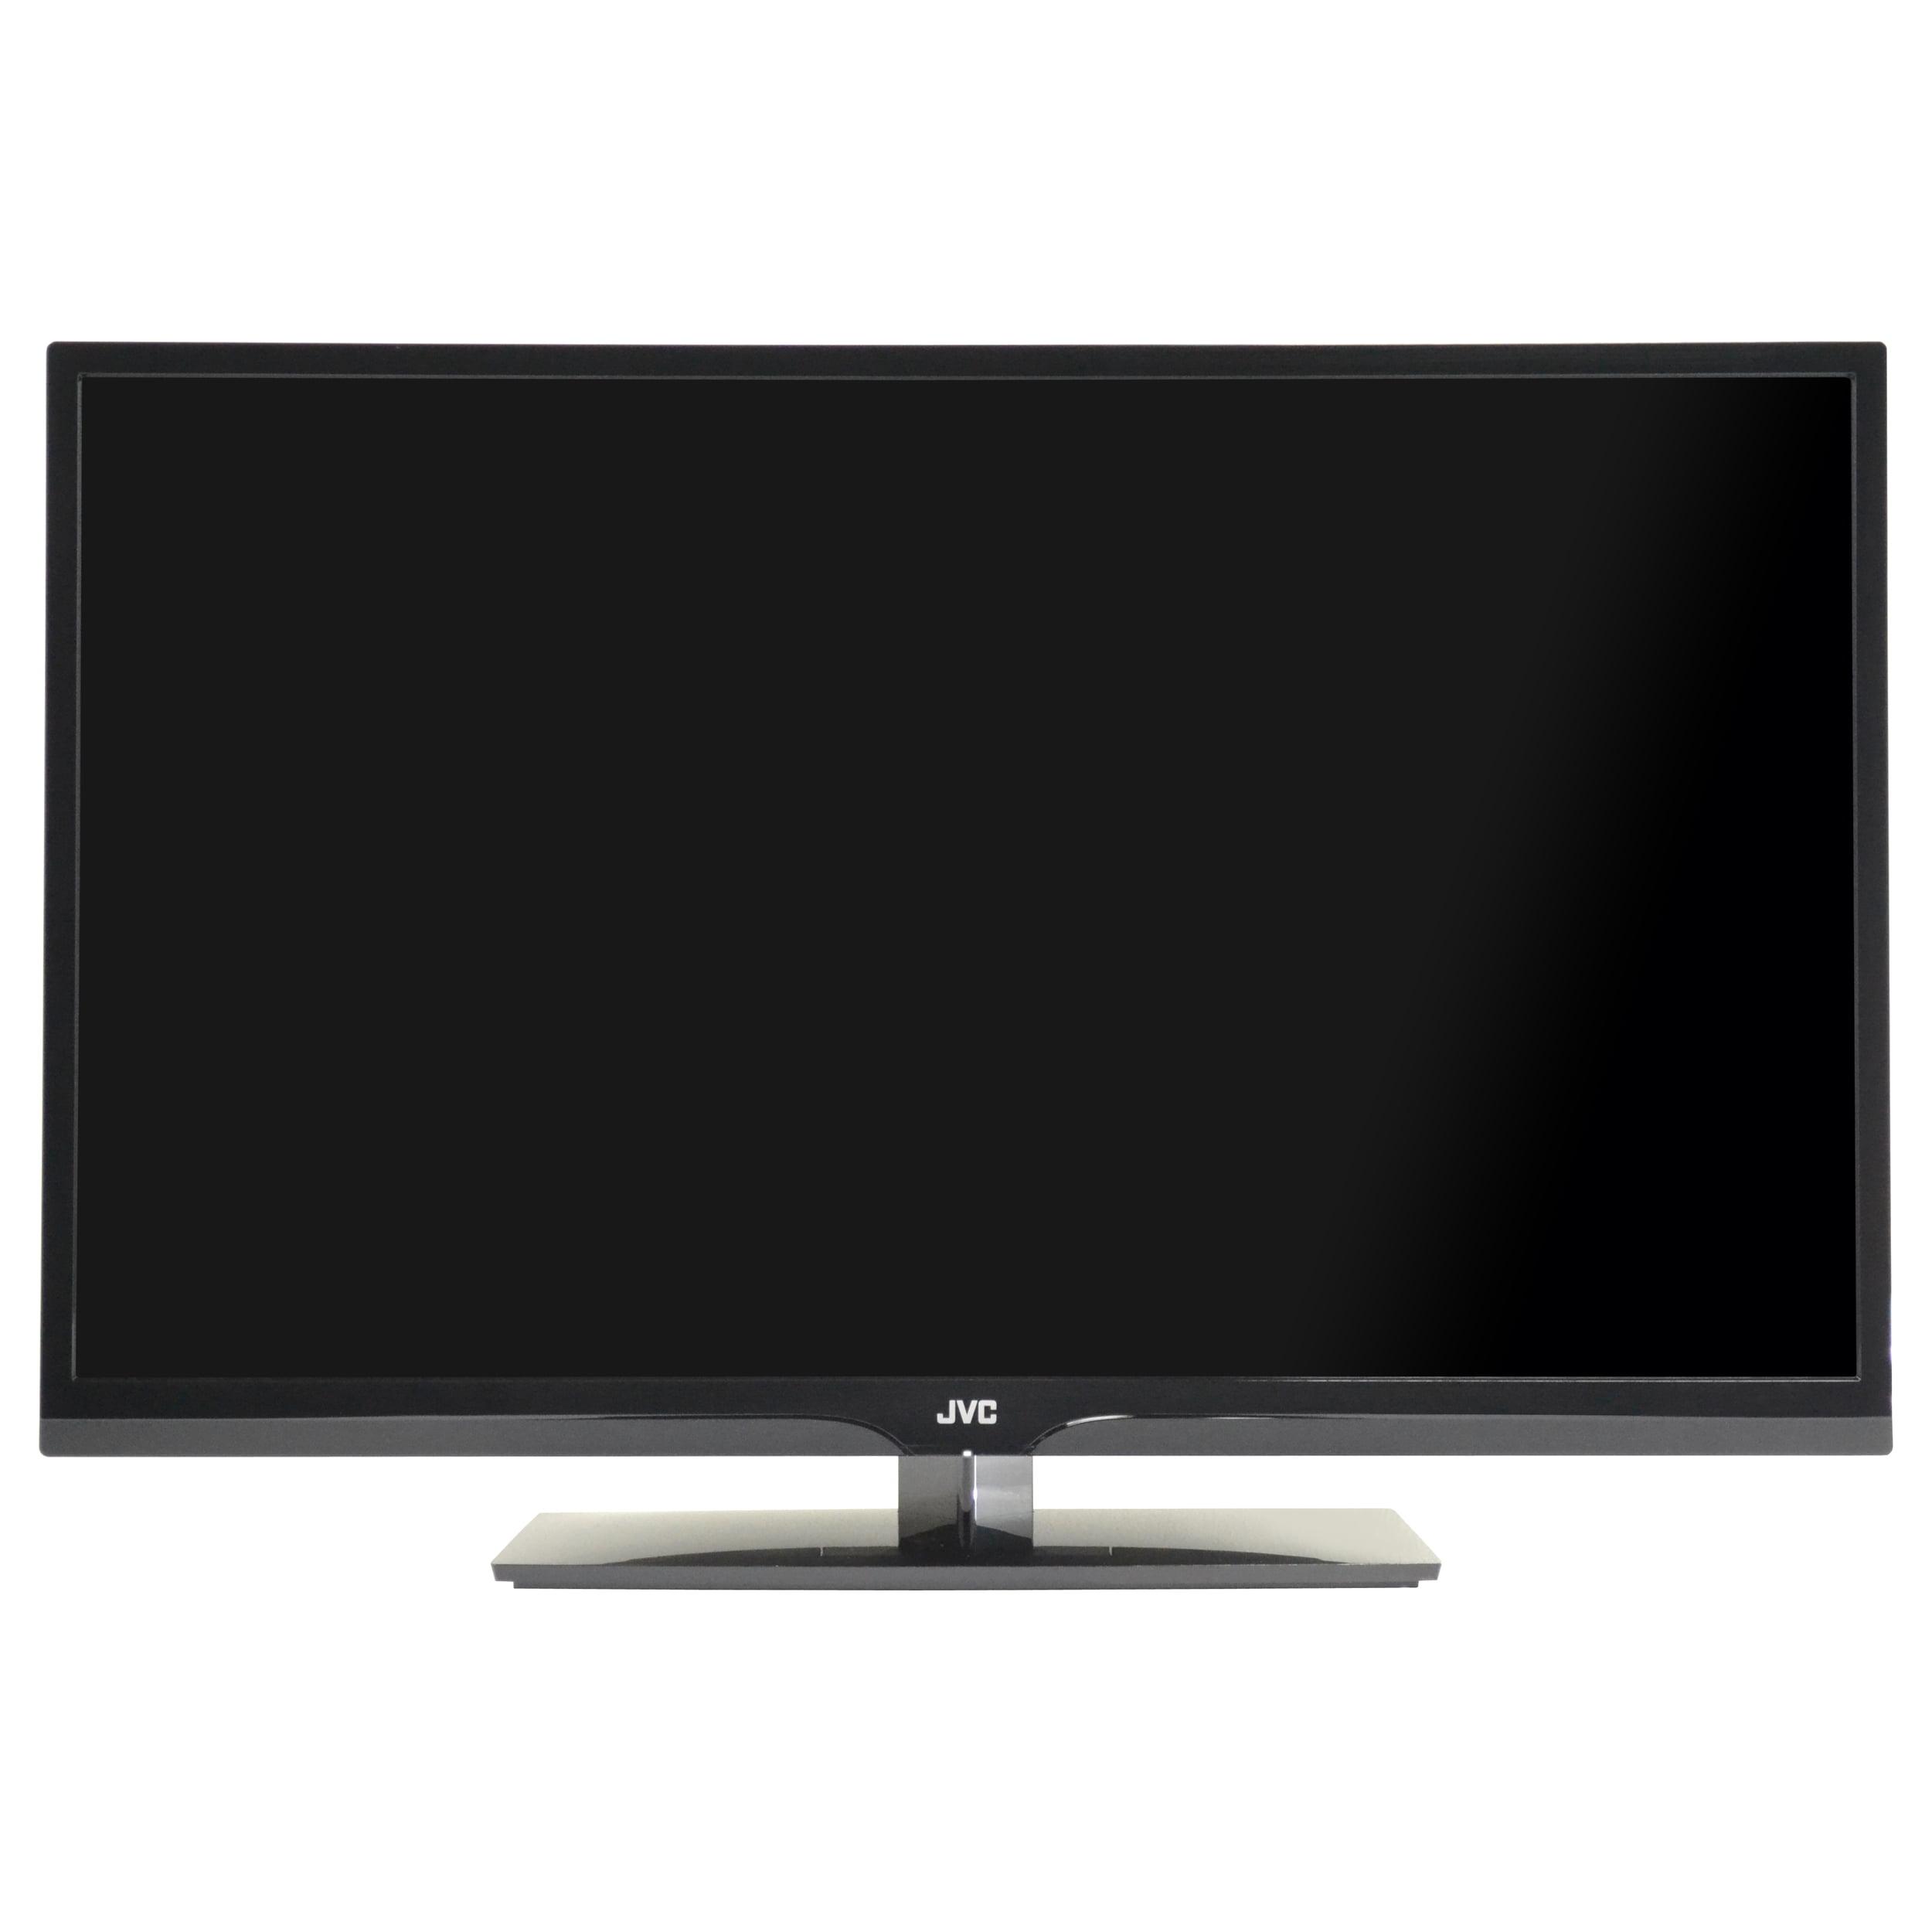 "JVC Emerald Series EM37T - 37"" Class ( 36.5"" viewable ) - Emerald Series LED TV - 720p - direct-lit LED"